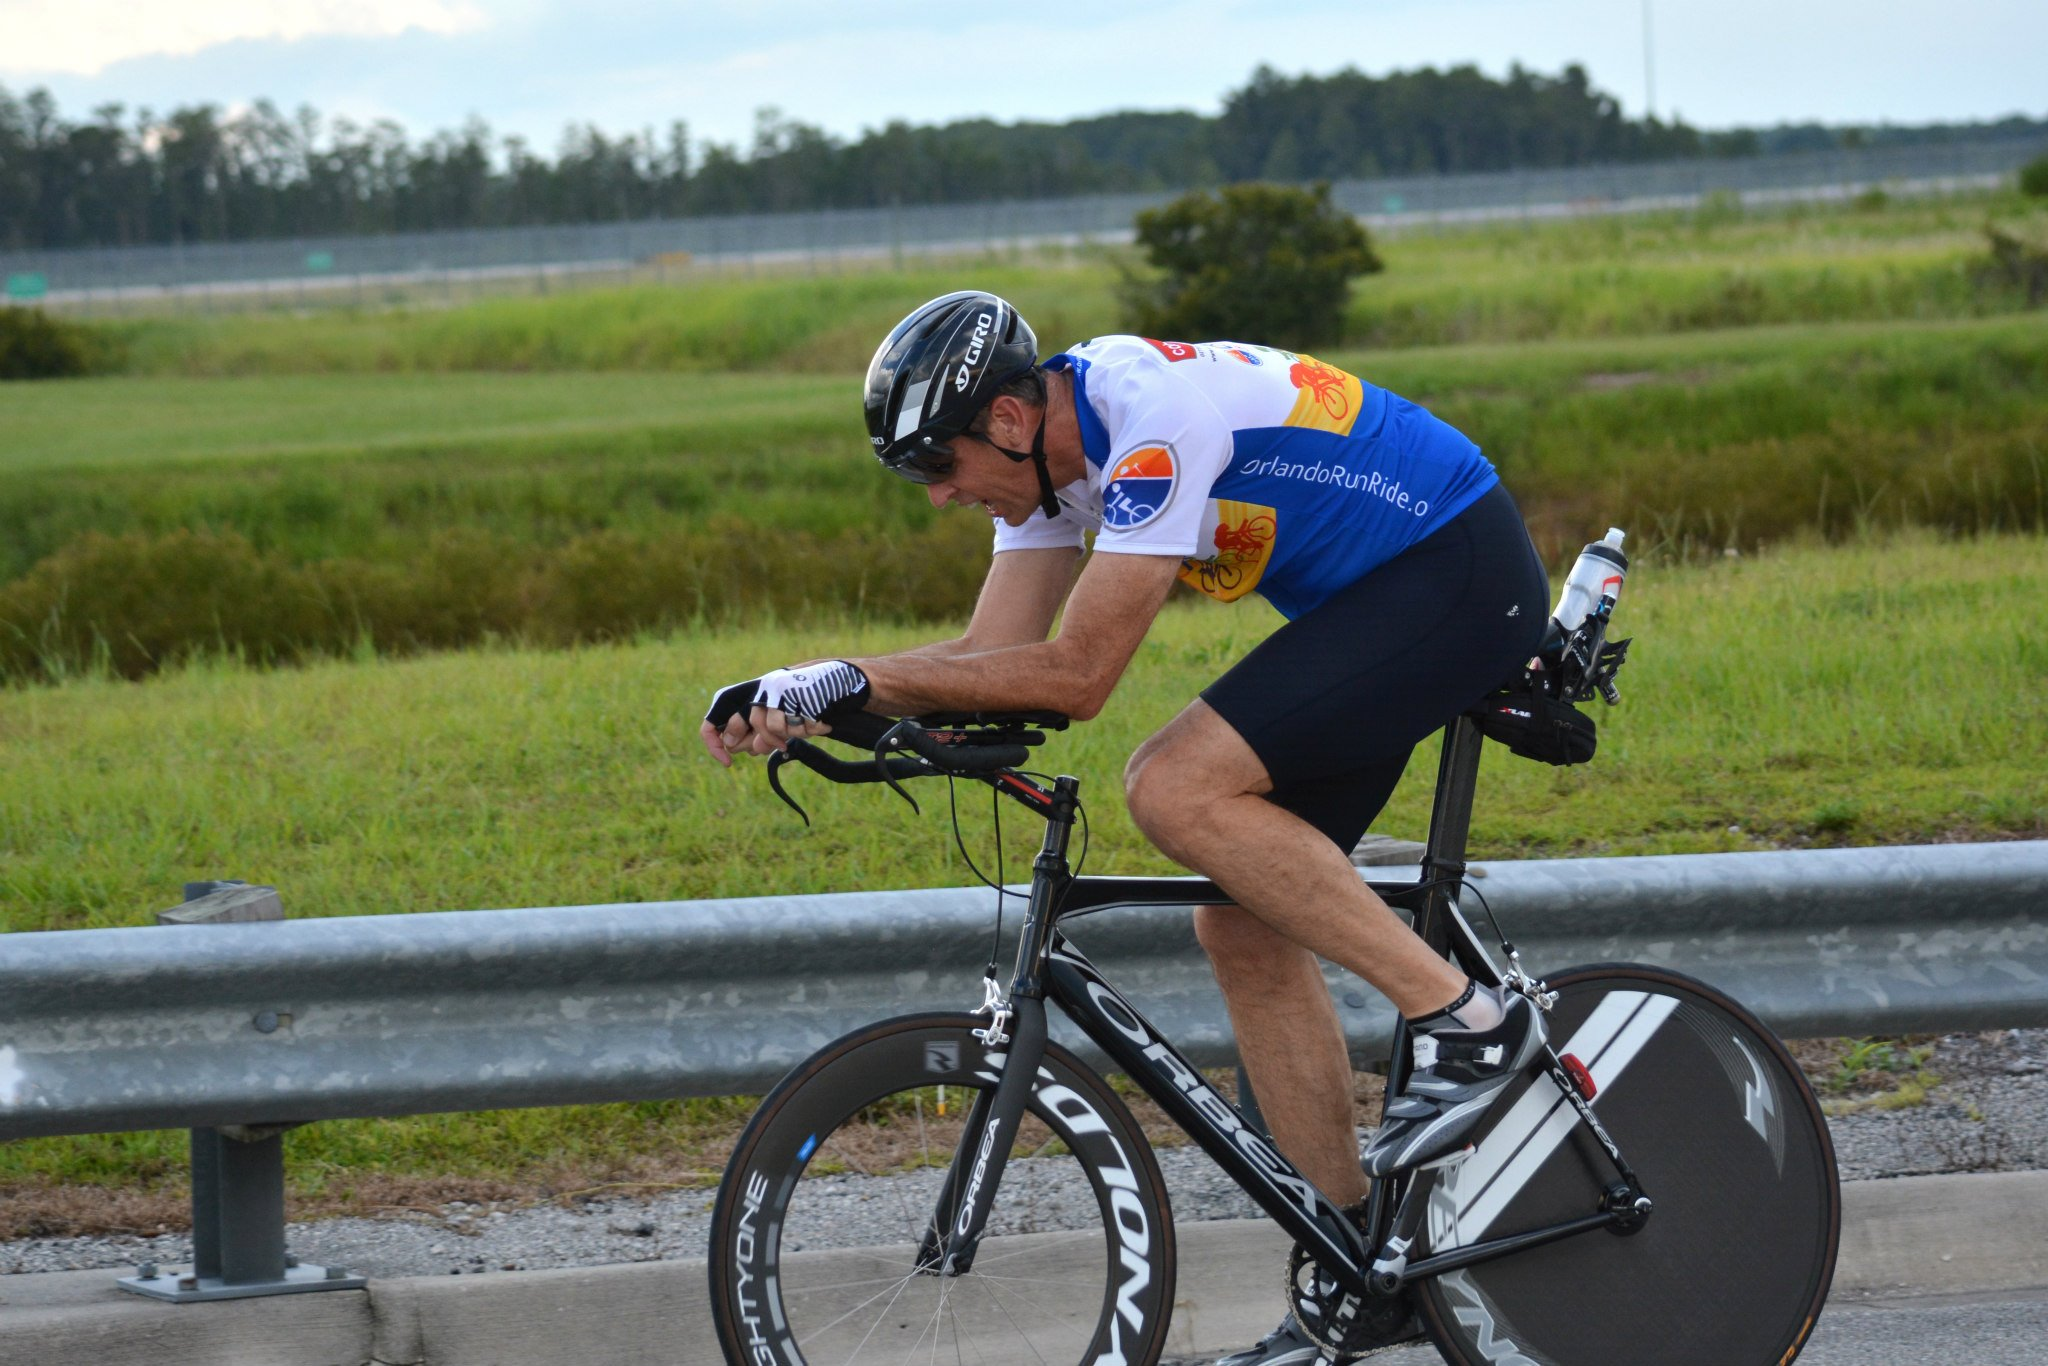 Randy at the finish (Darby Hardesty Photo)